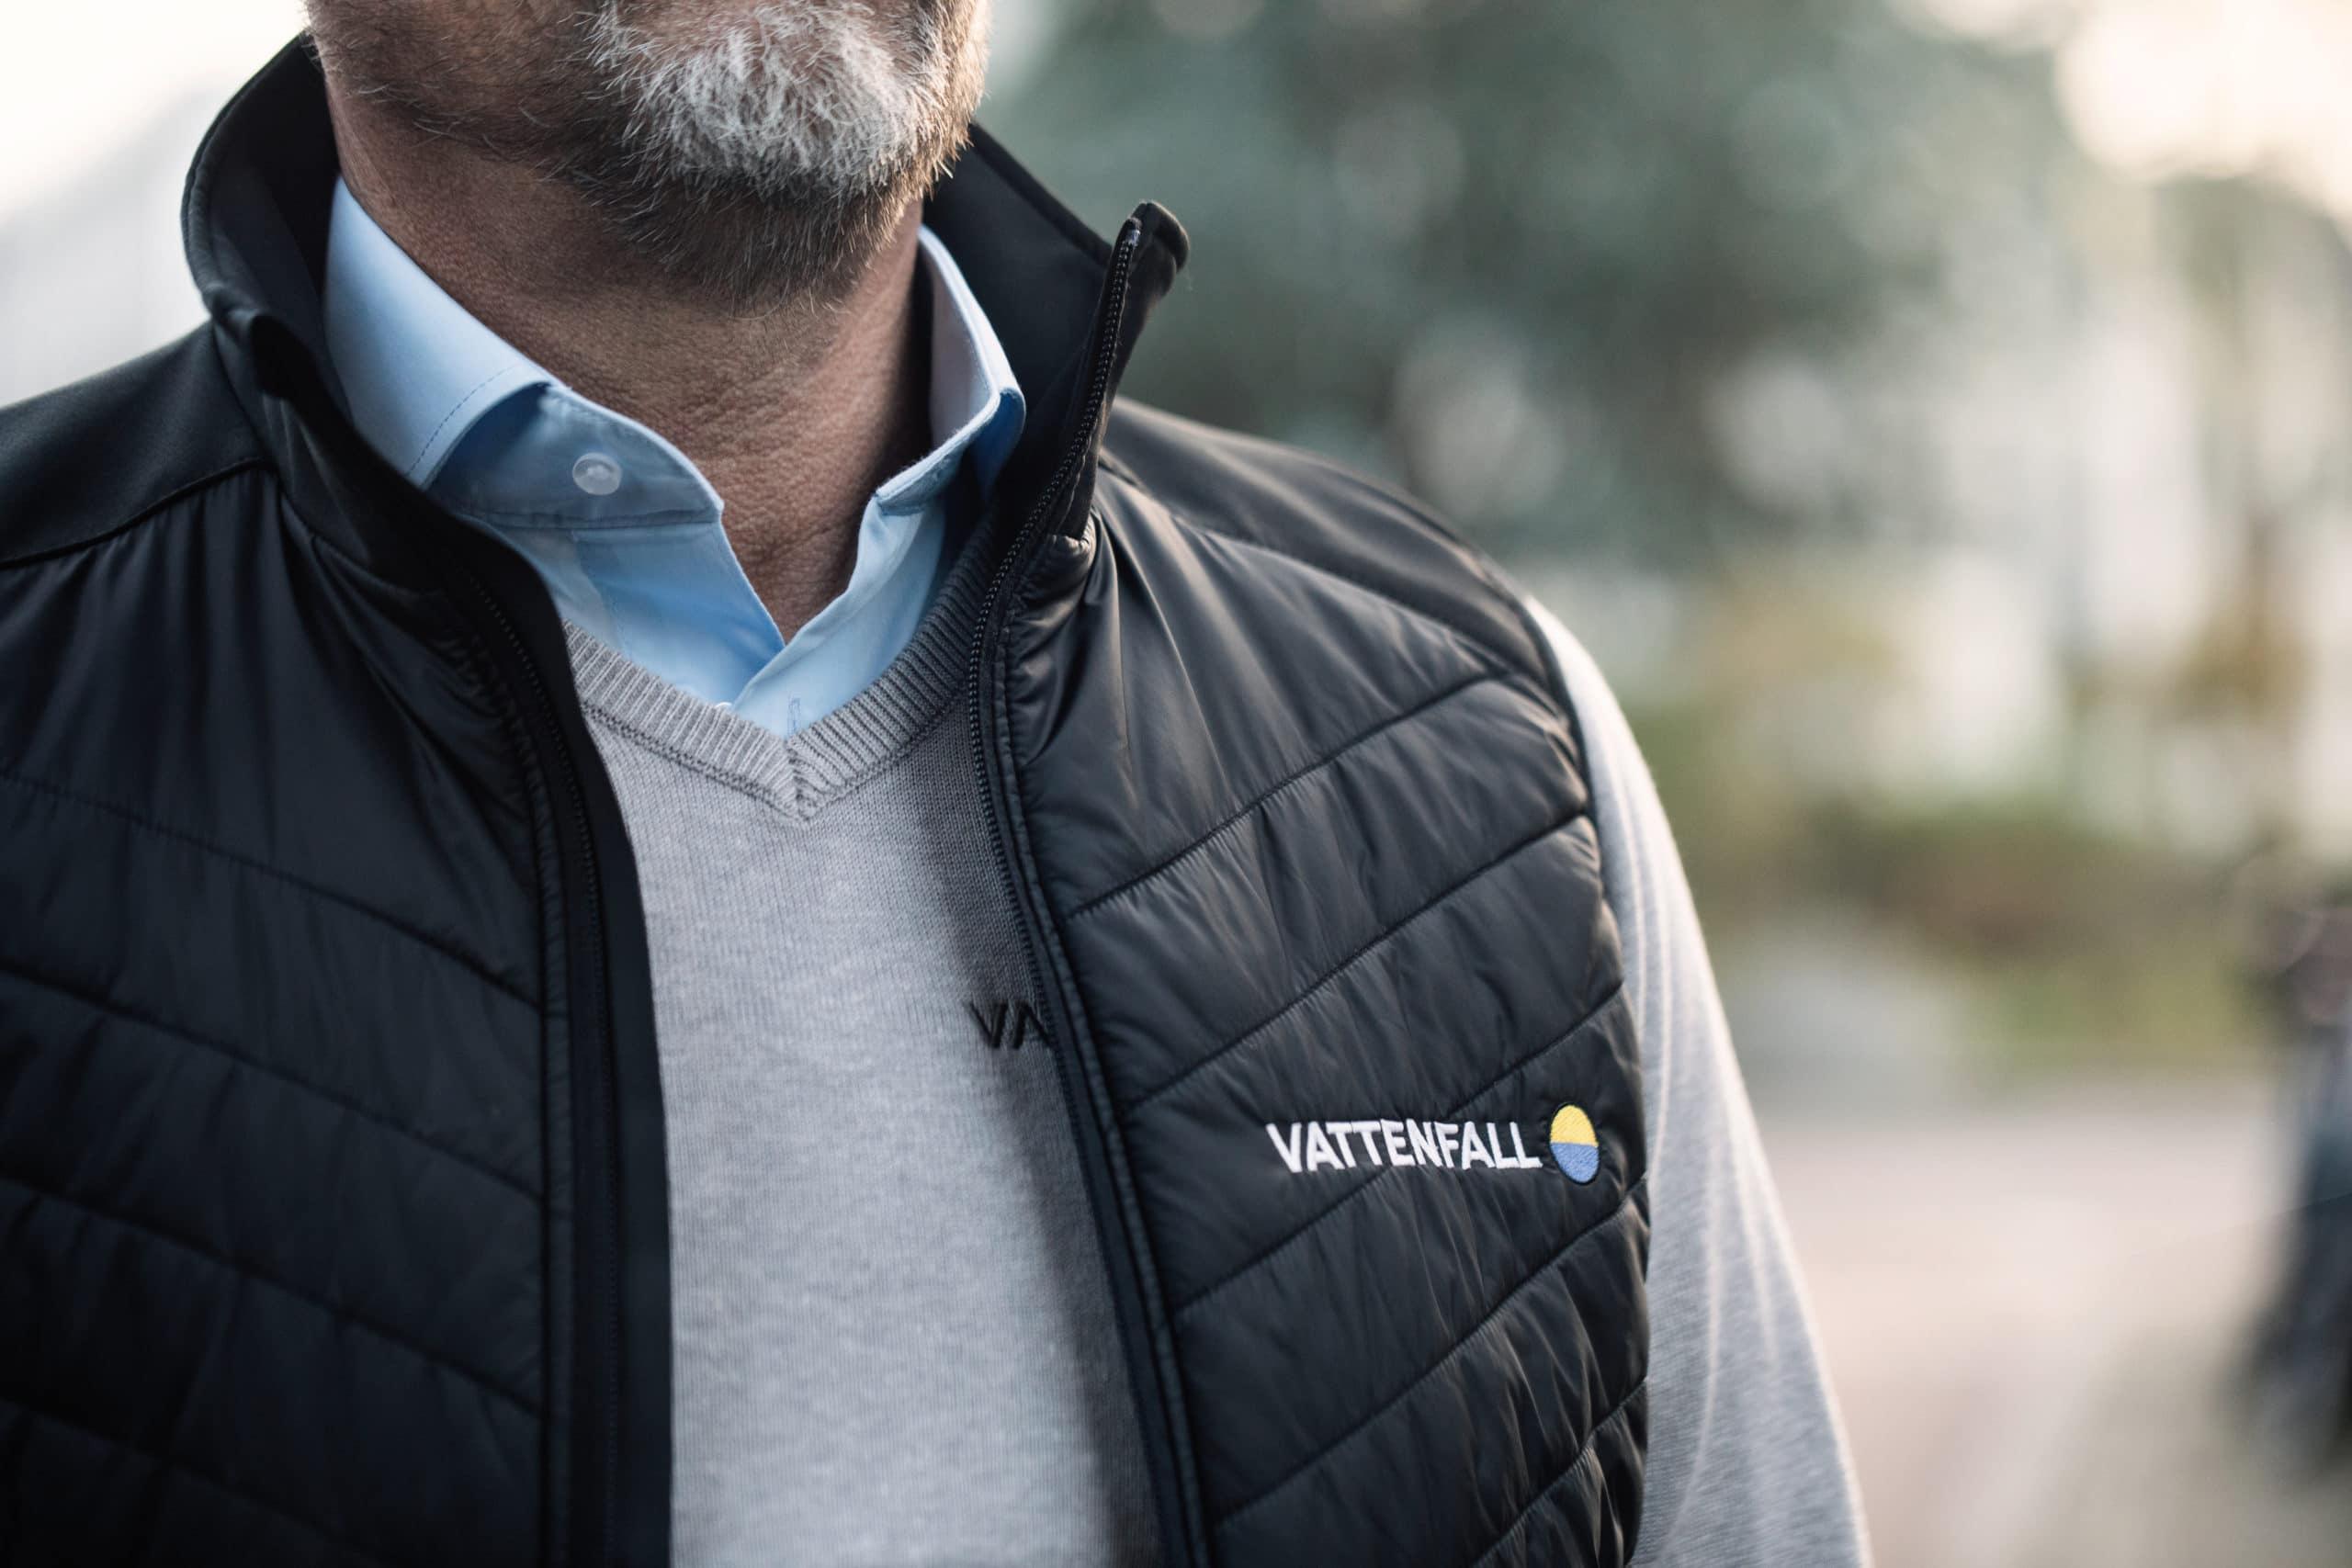 Bedrijfskleding casual Vattenfall verkoper met overhemd pullover en logo's